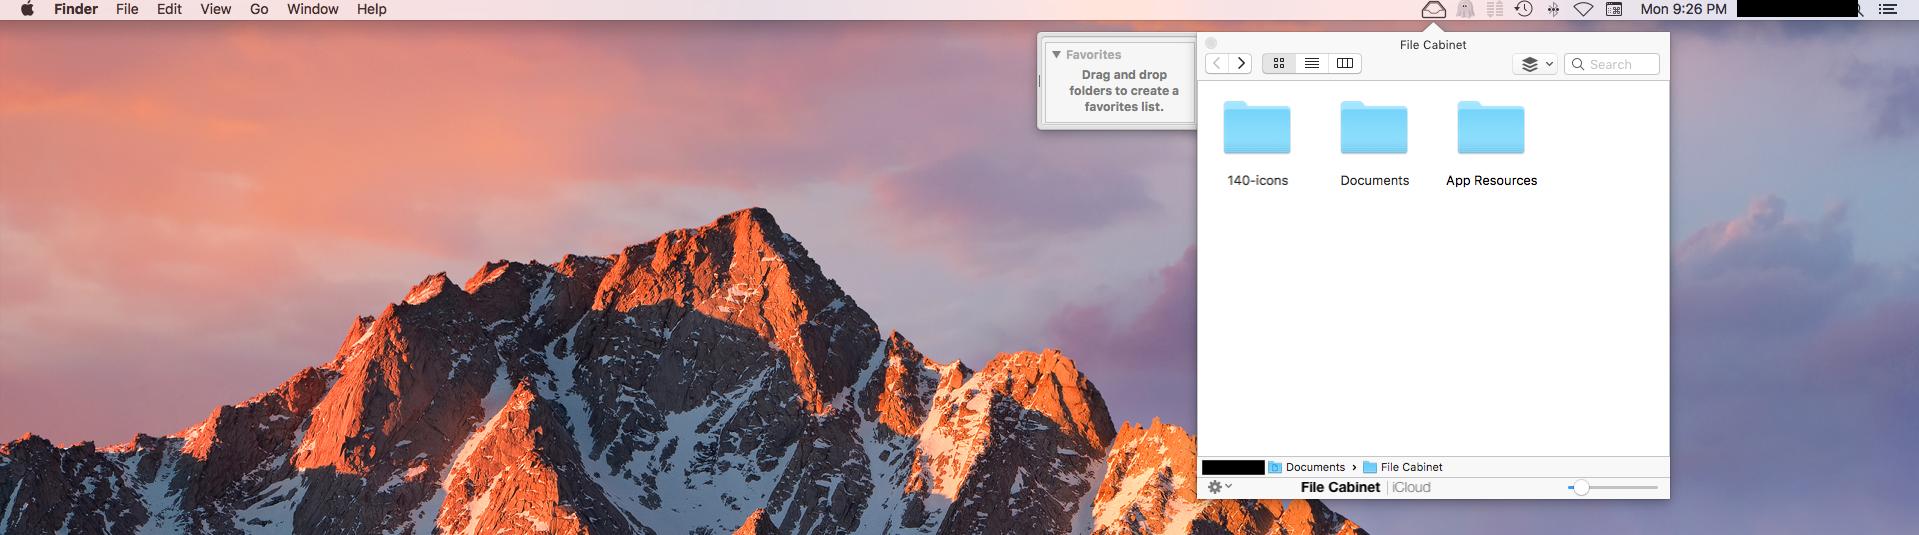 screenshotpathbar 2.png